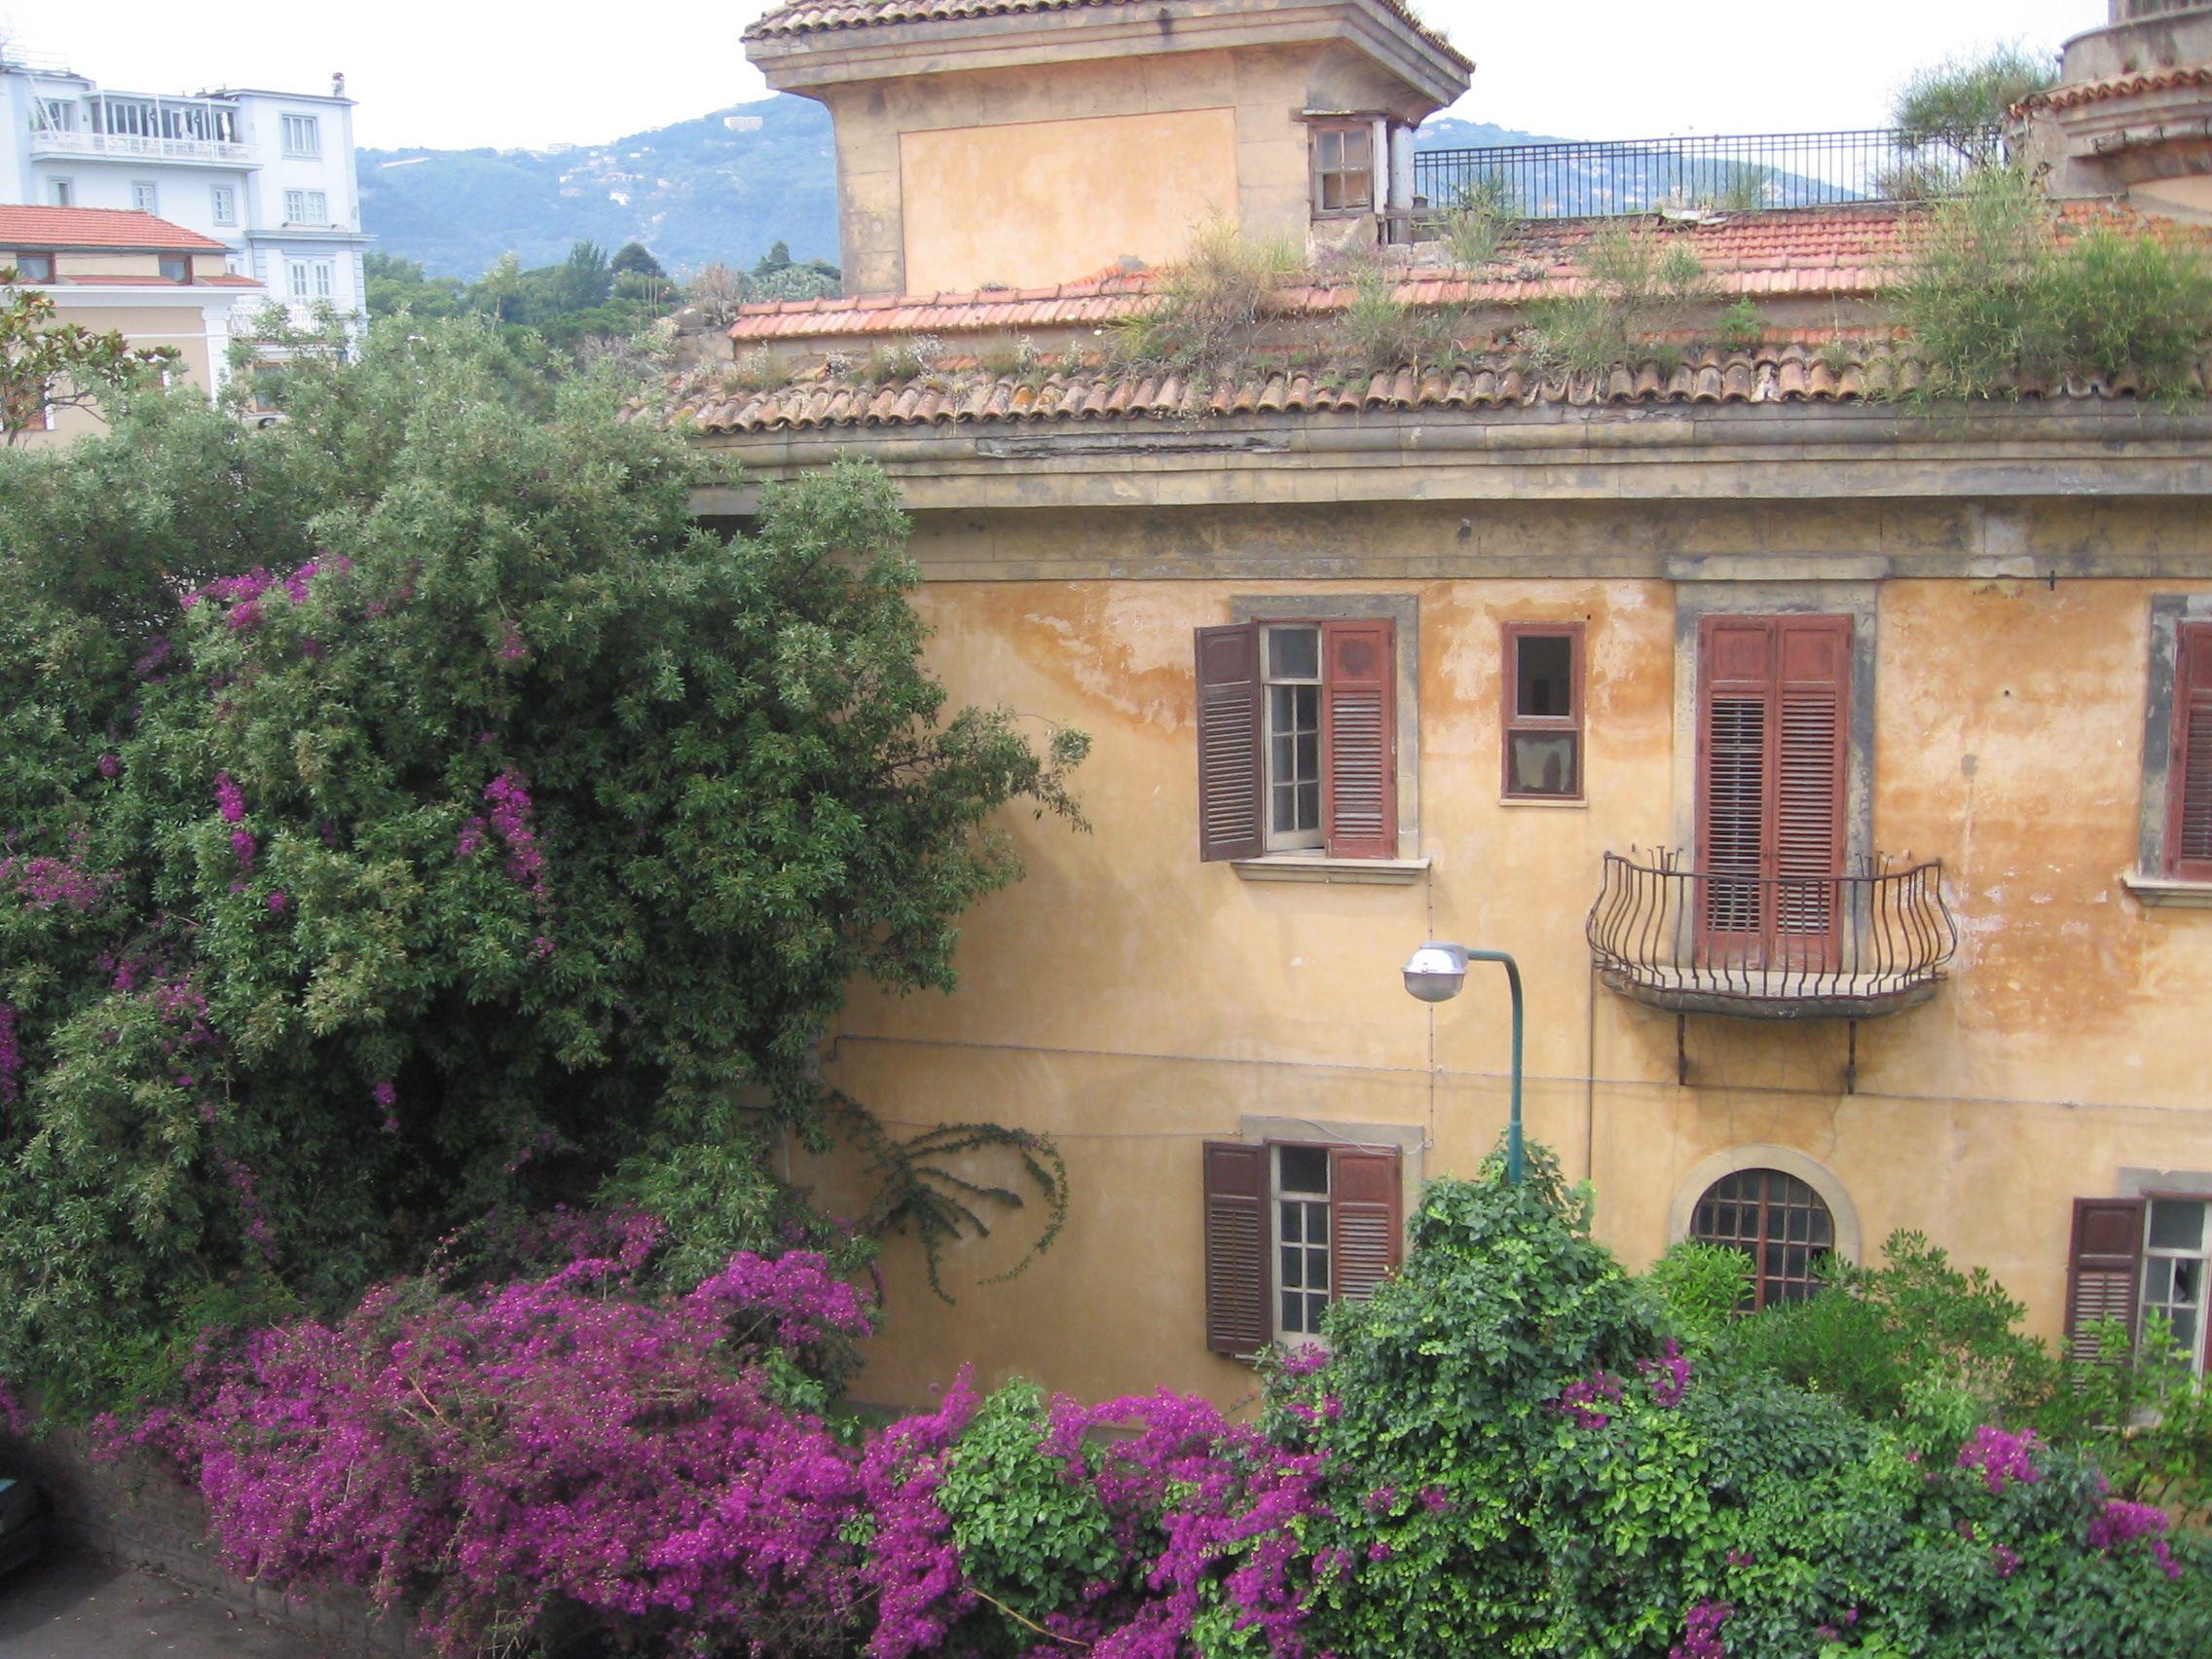 San Agnello (Sorrento area)